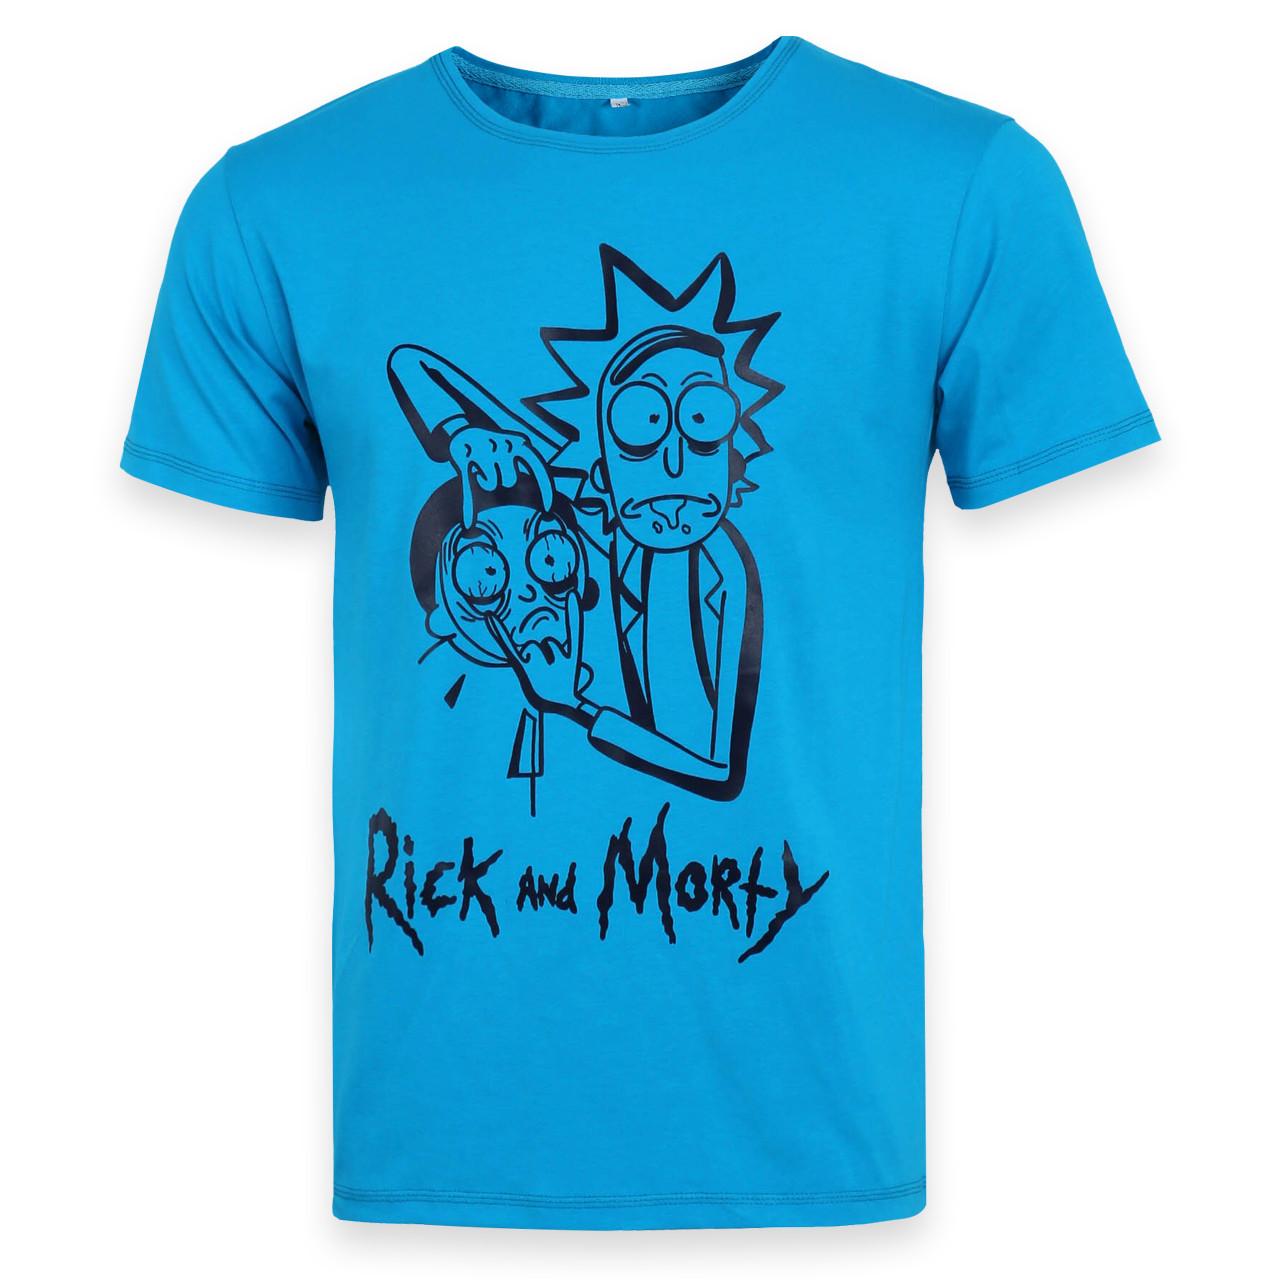 Футболка мужская голубая HOPE с принтом RICK&MORTY Ф-10 GLB L(Р) 20-803-020